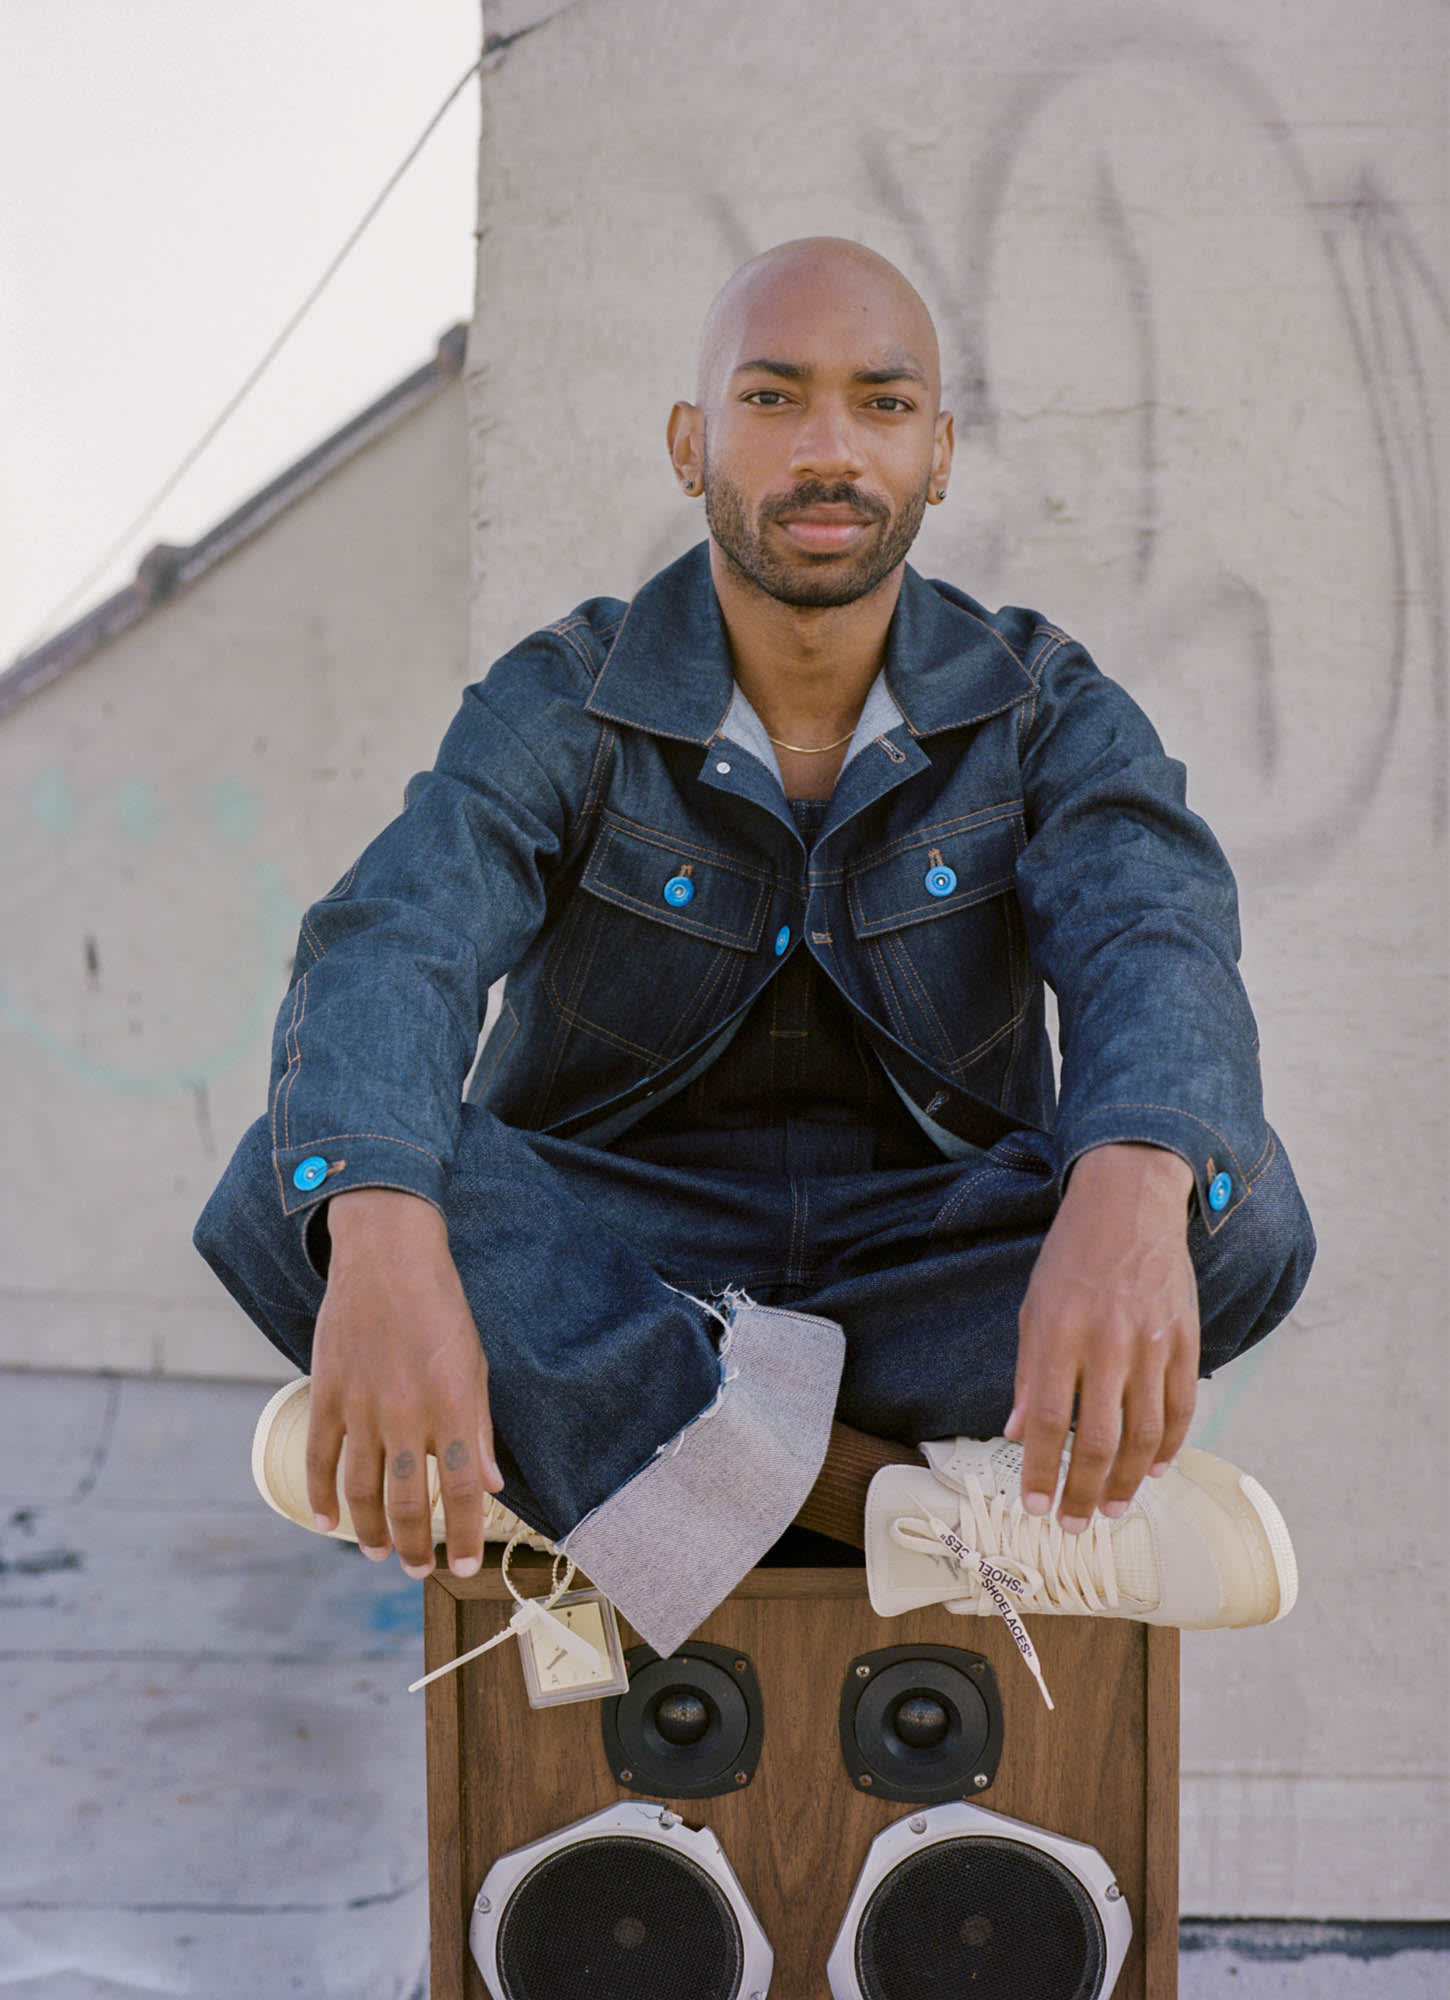 Black Fashion Fair Founder, Antoine Gregory